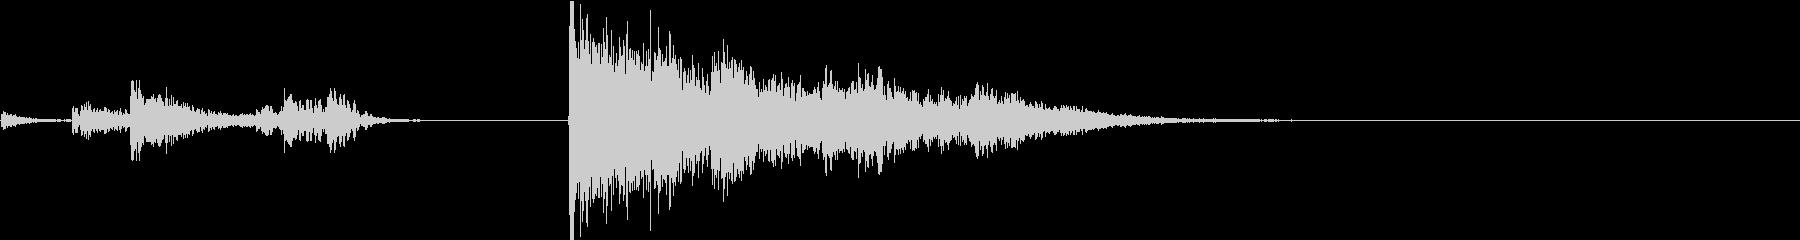 Game 金属製の仕掛け・罠の音 鎖式の未再生の波形